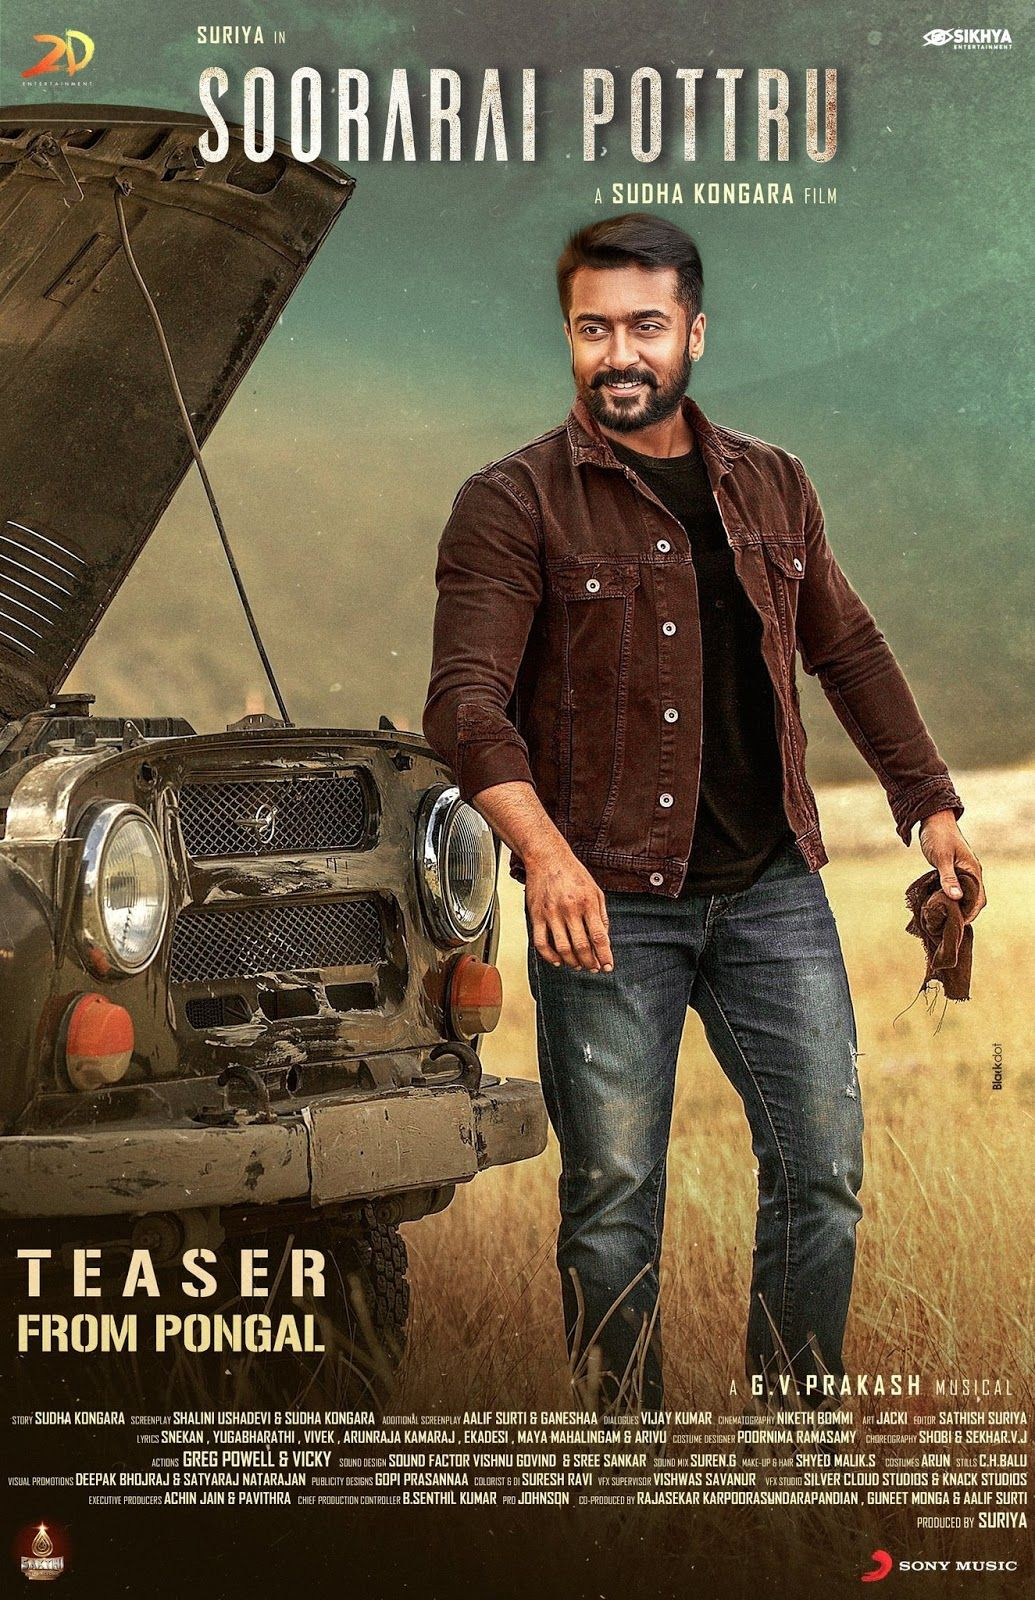 Soorarai Pottru Teaser From Pongal Bollywood Movies Online Teaser Bollywood Movies